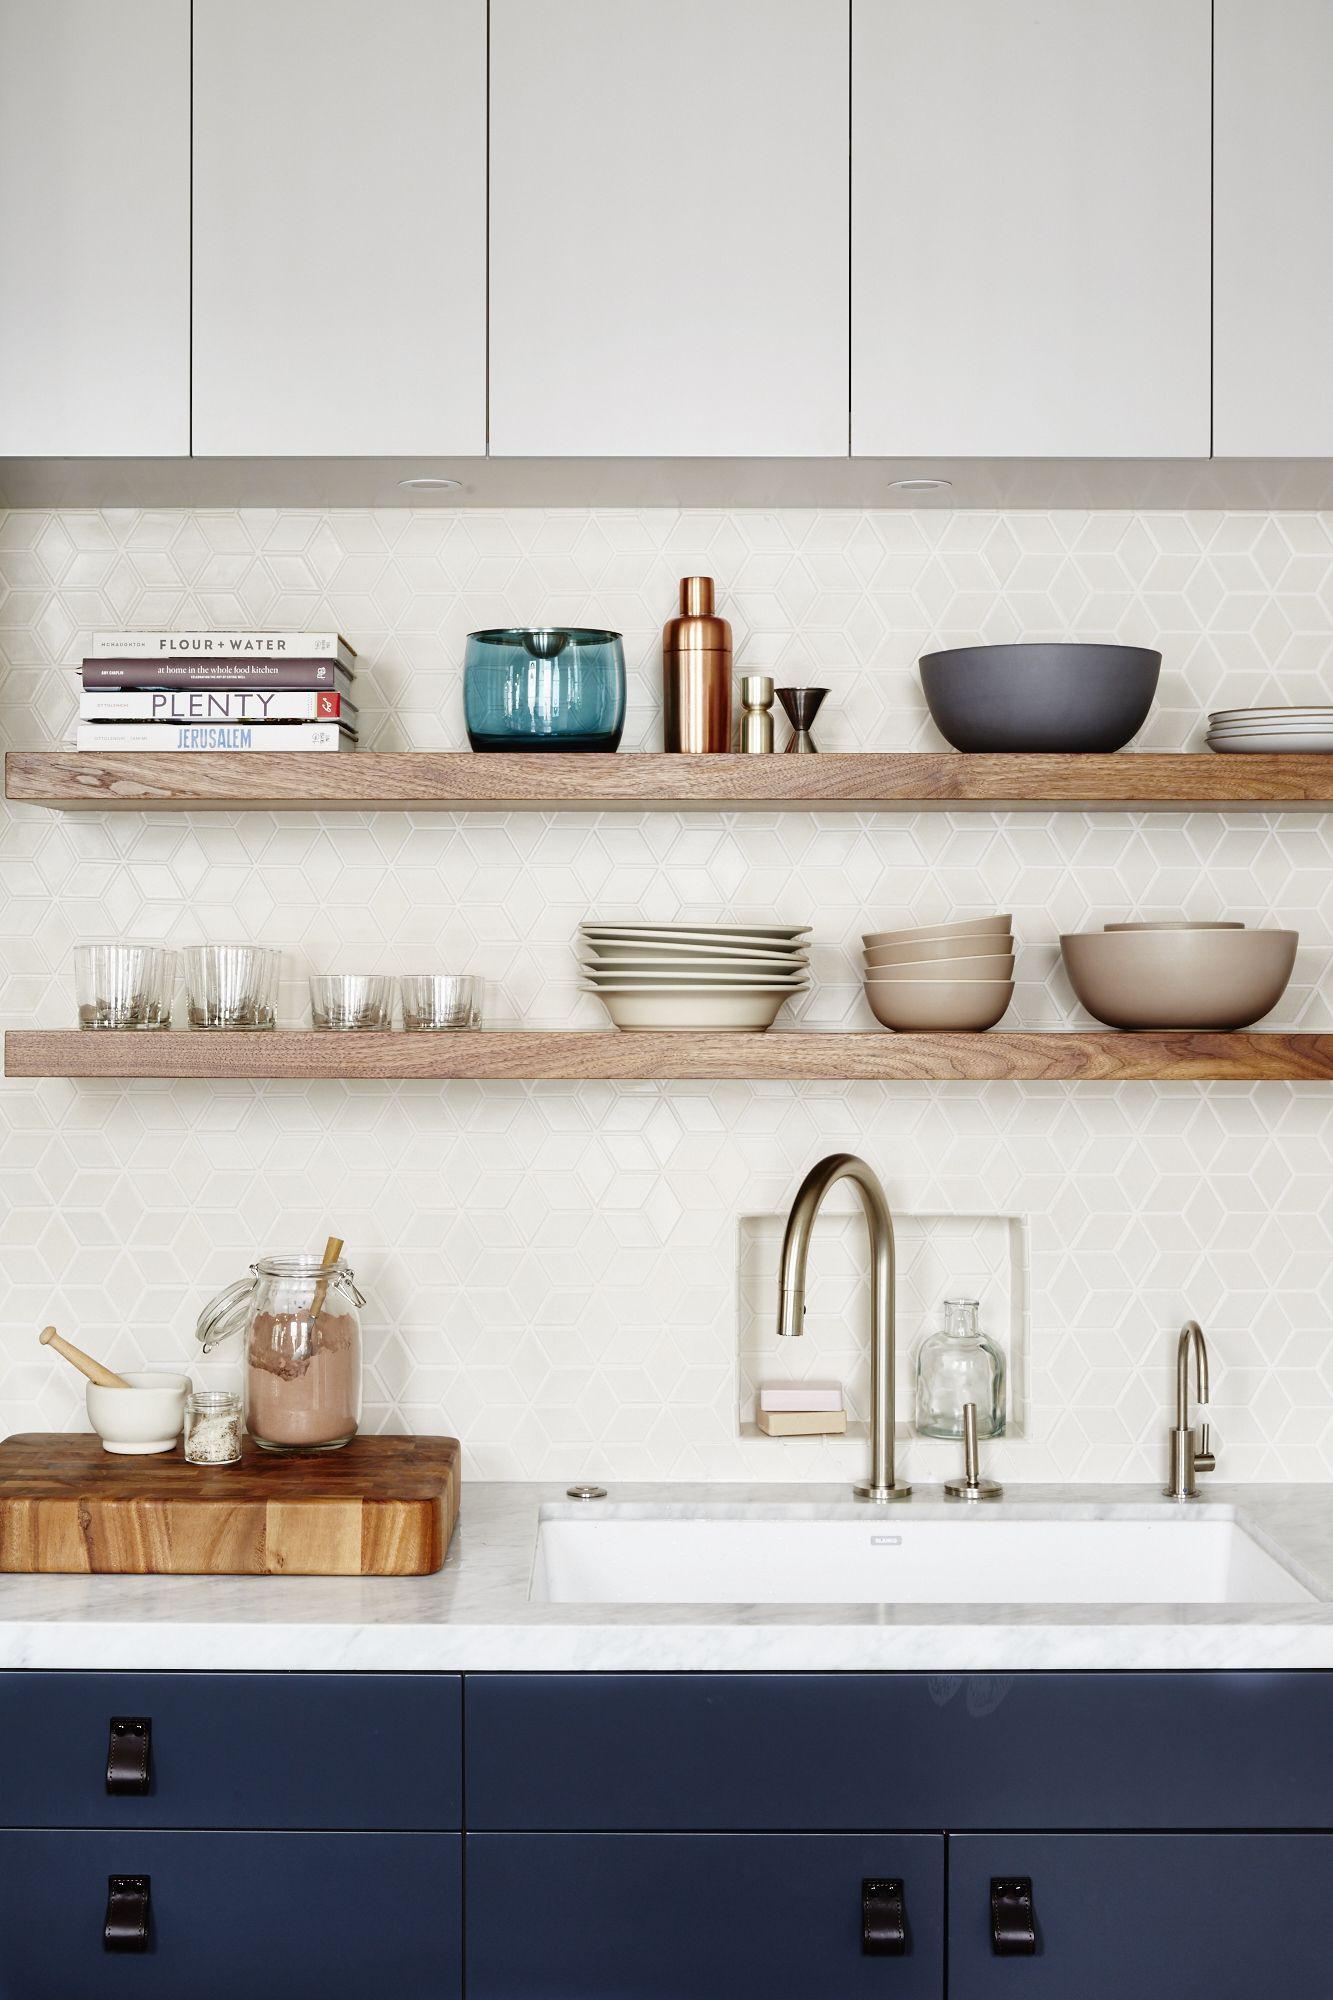 Studio_Muir_Haight_Kitchen_077.jpg | Home | Pinterest ...